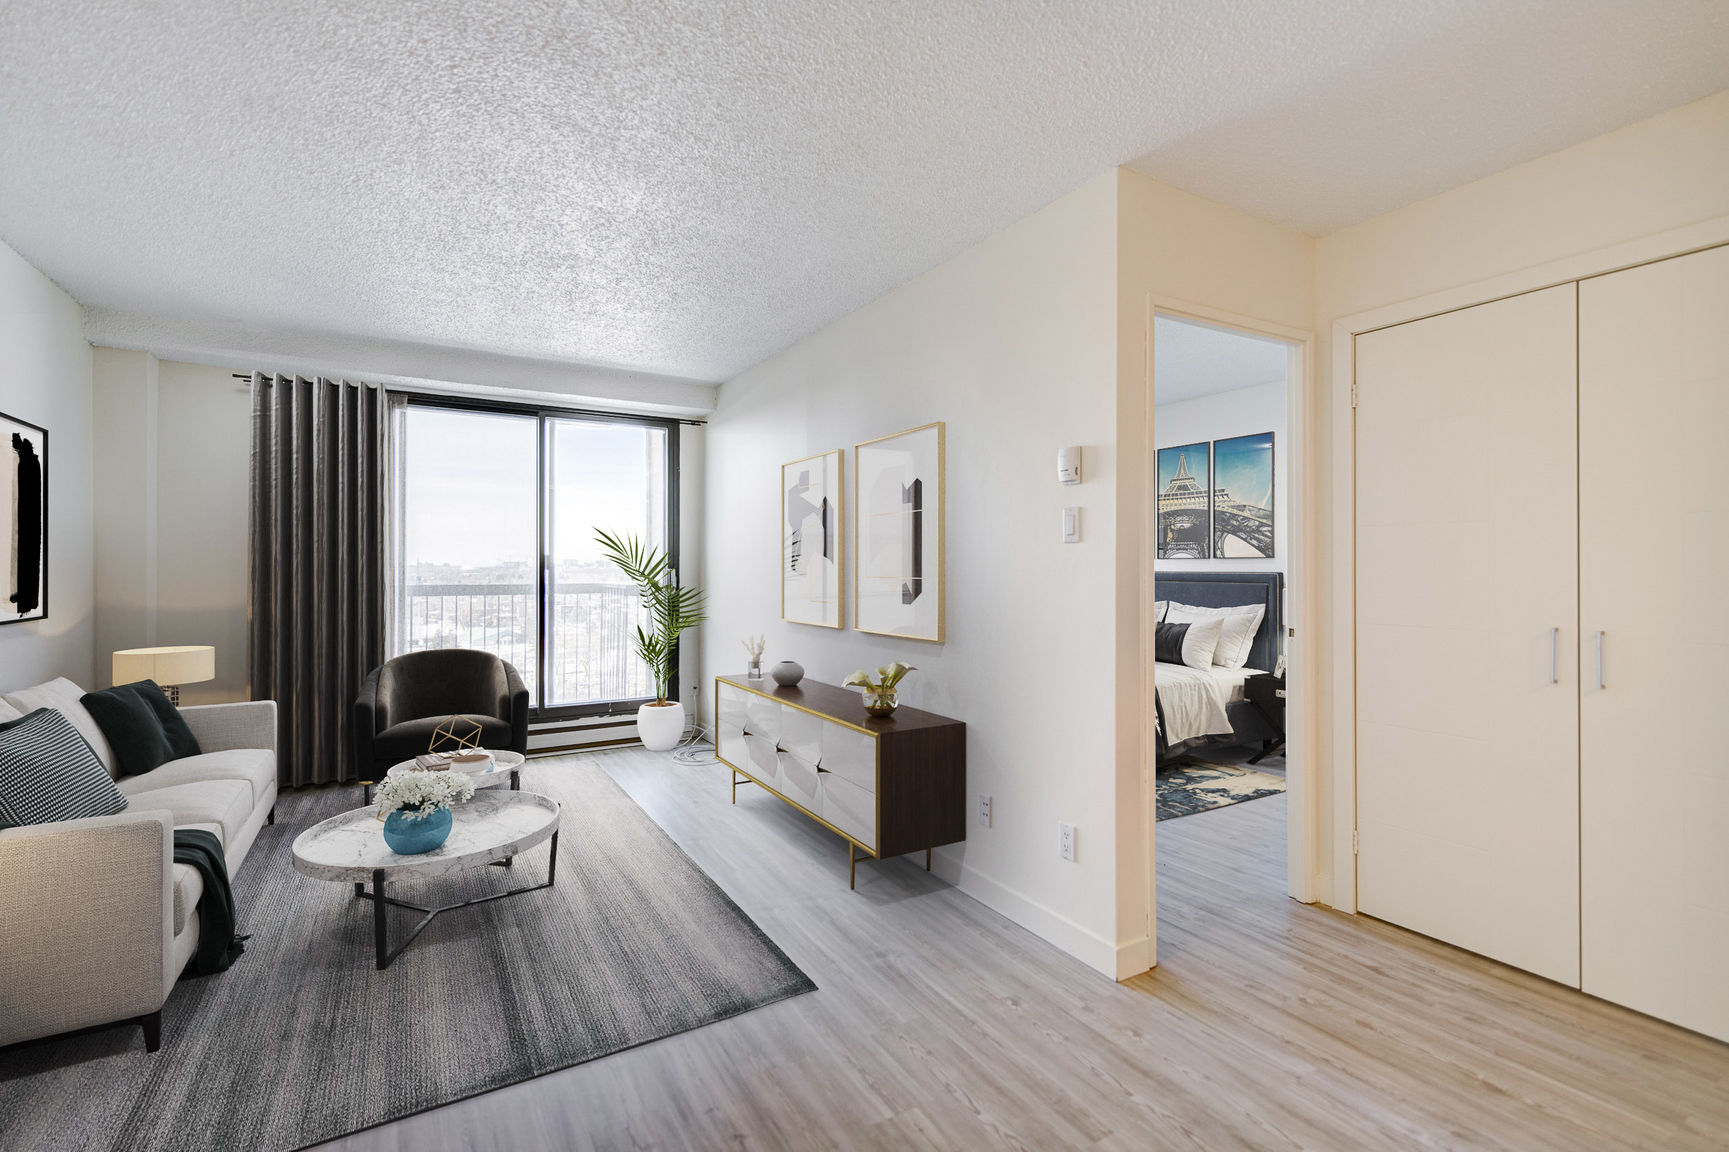 1 bedroom Apartments for rent in Laval at Le Quatre Cent - Photo 02 - RentQuebecApartments – L407184